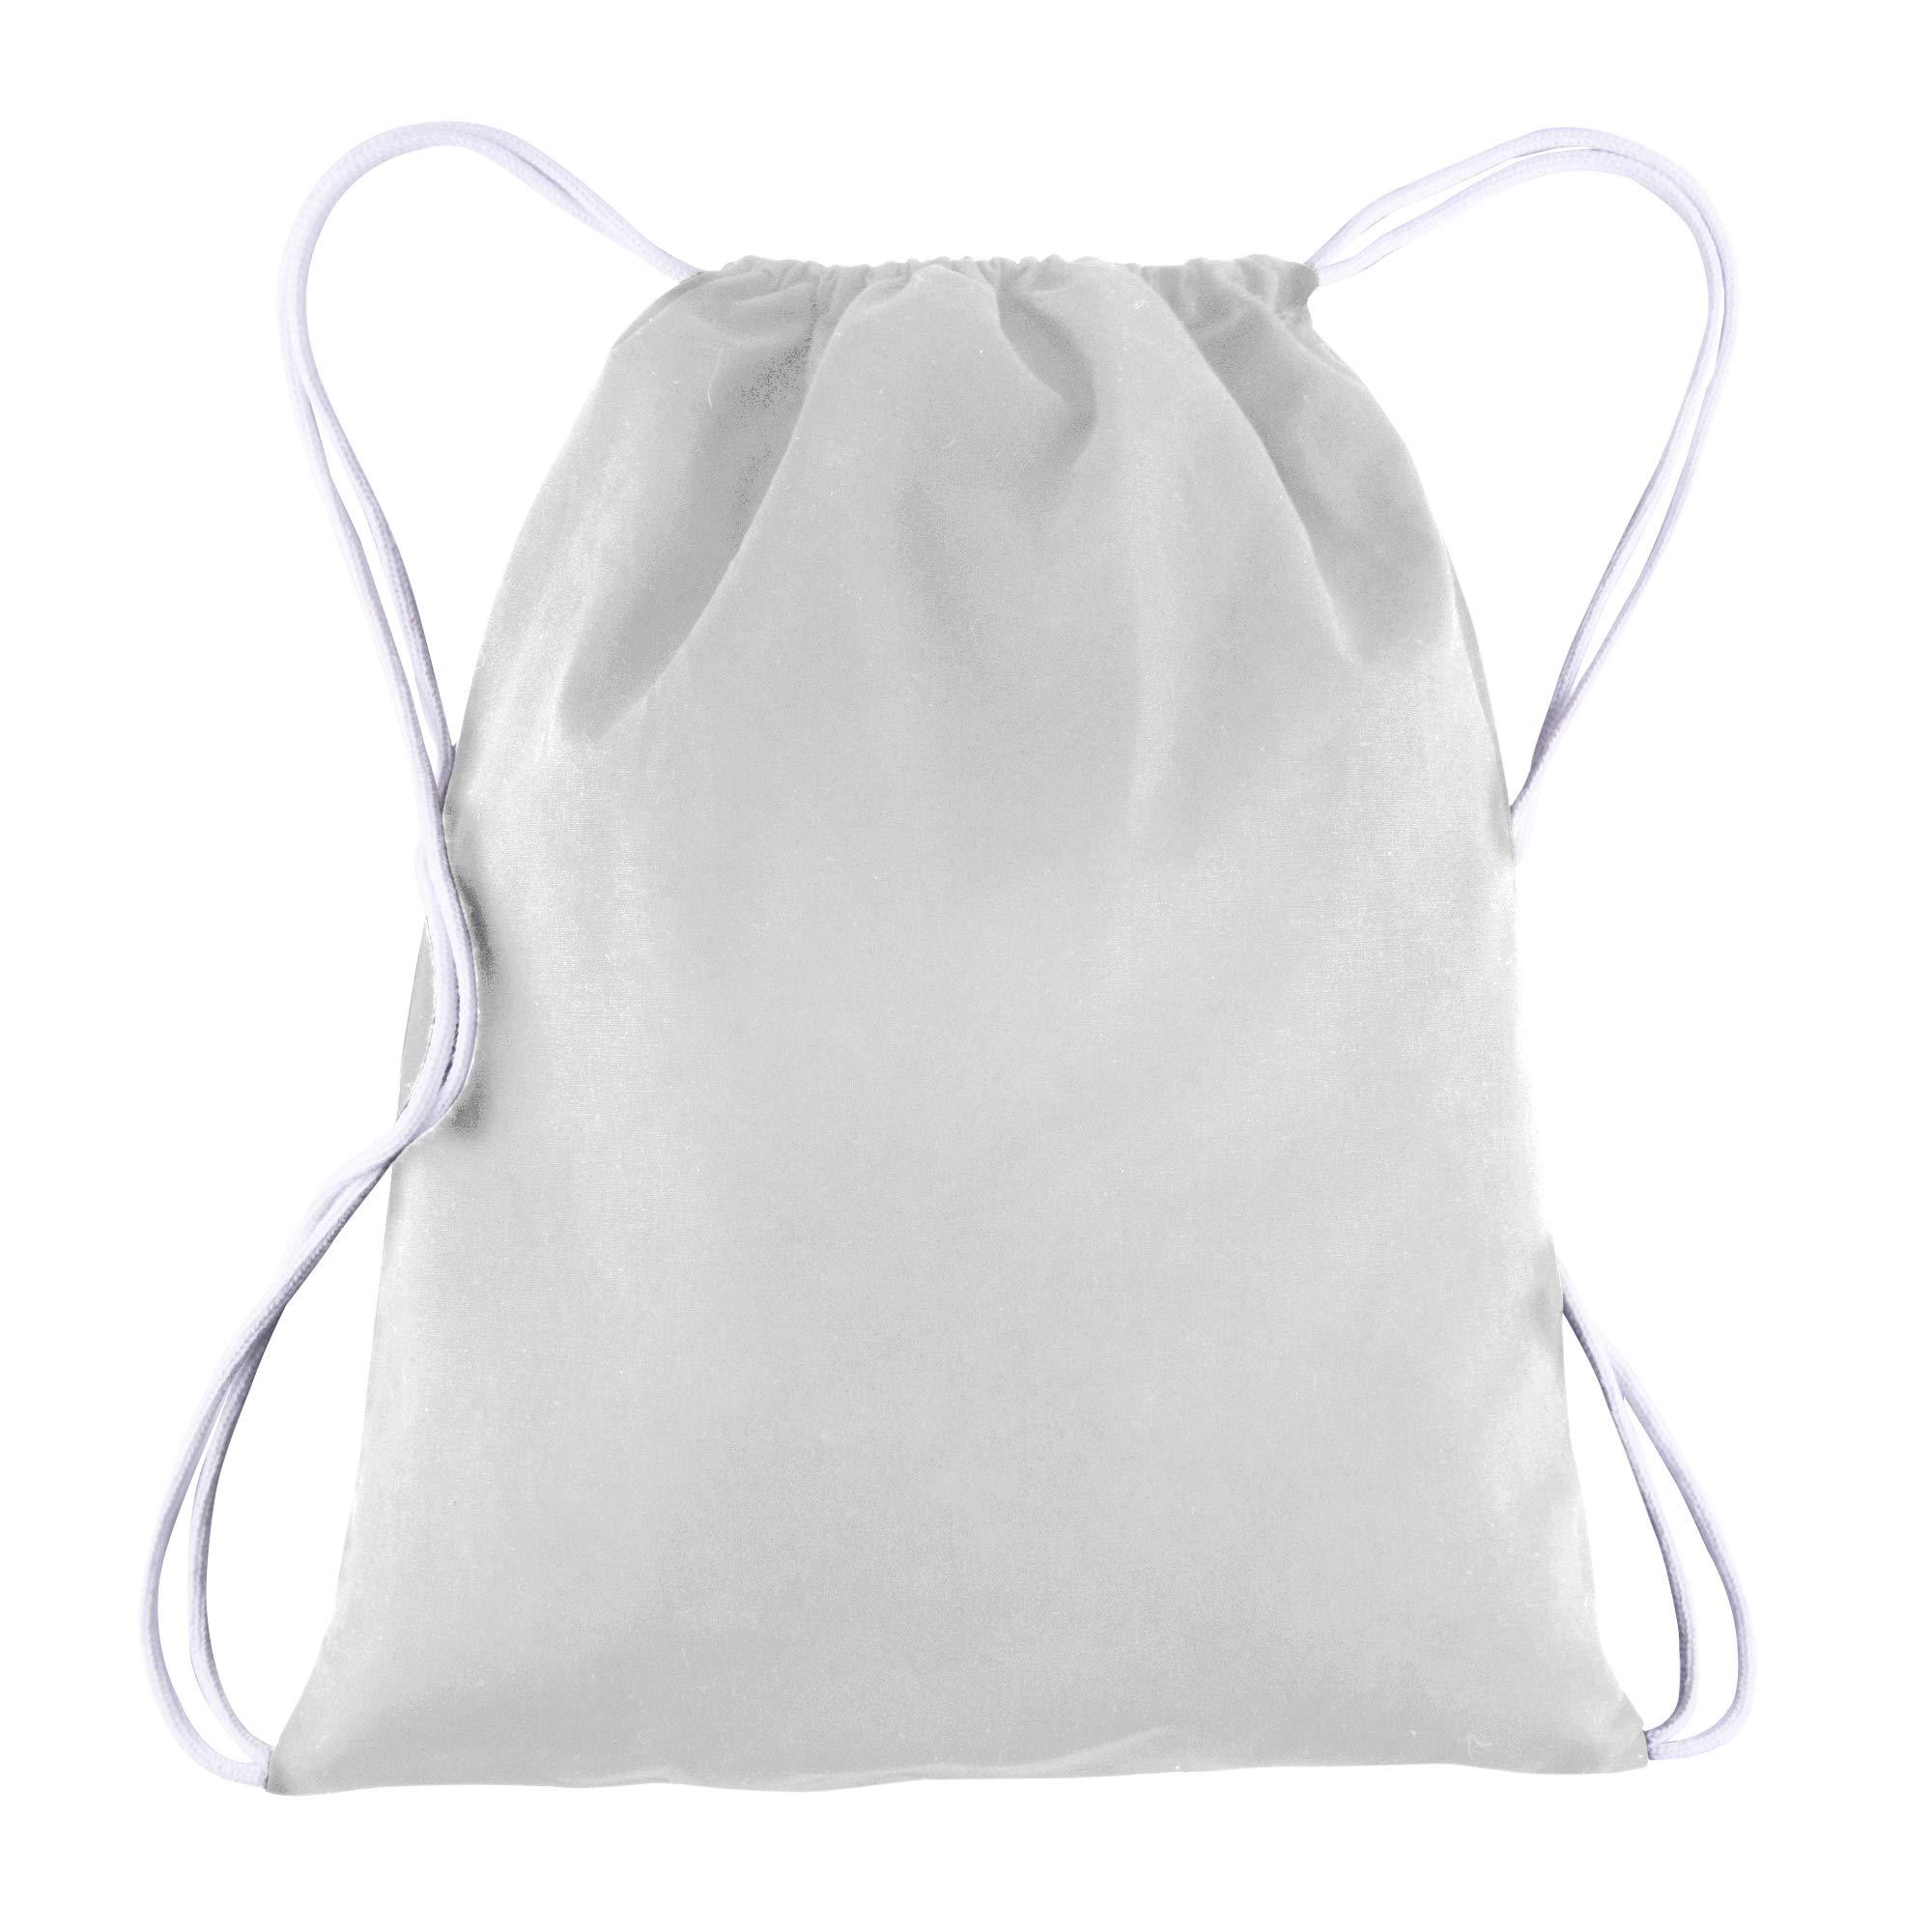 BagzDepot 100% COTTON Budget Friendly Sport Drawstring Bag Cinch Packs (White)